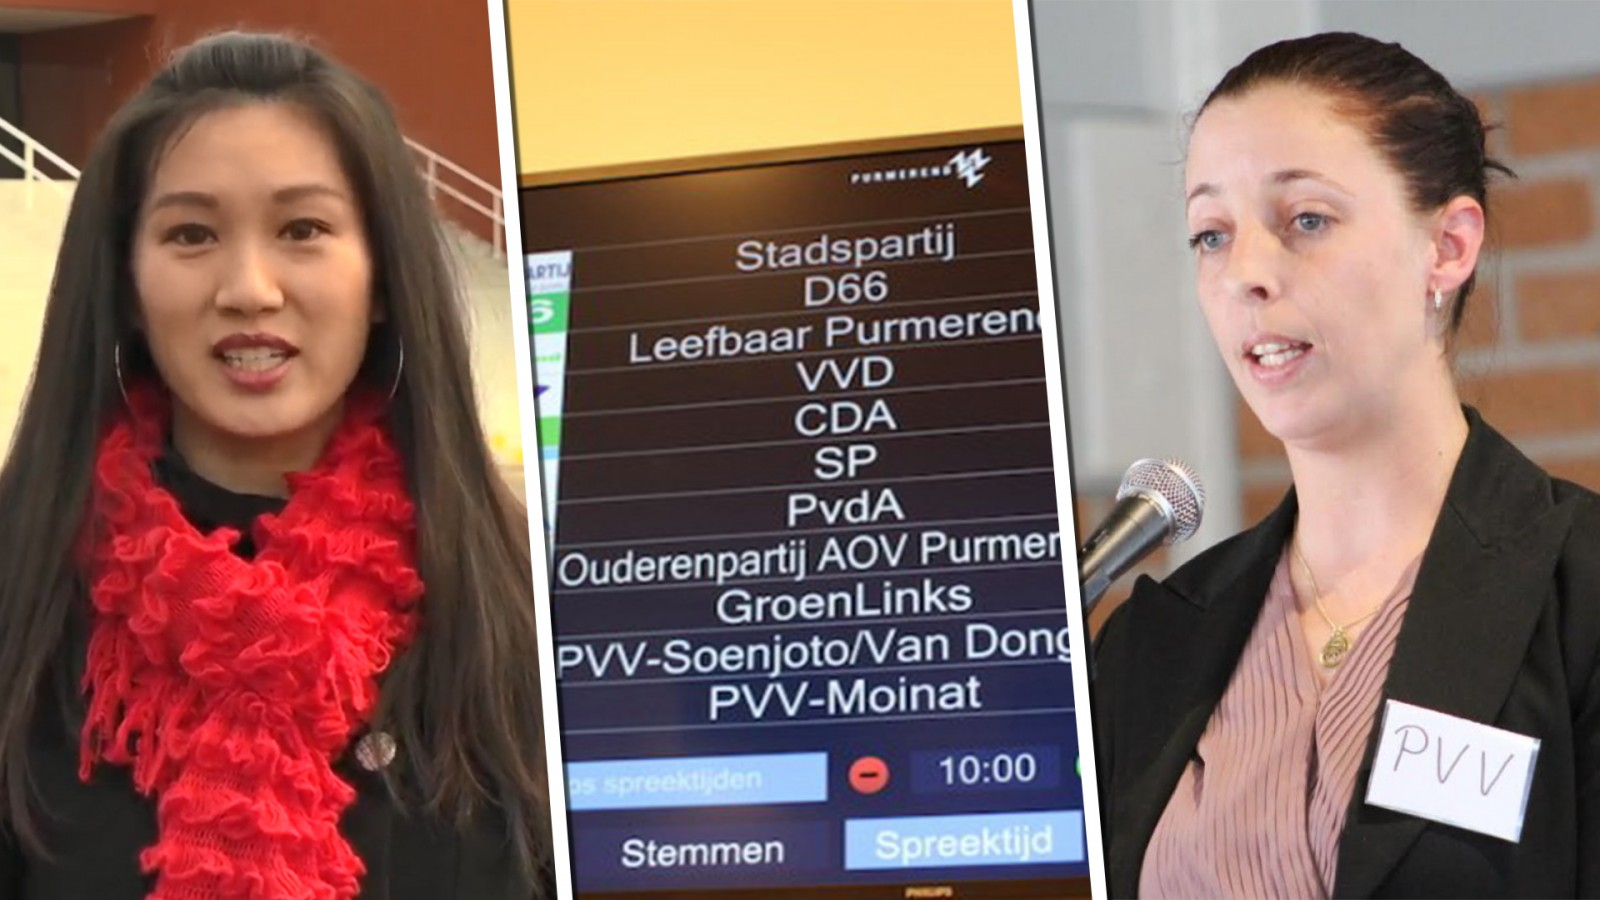 PVV Purmerend/Regio Purmerend/NH Nieuws